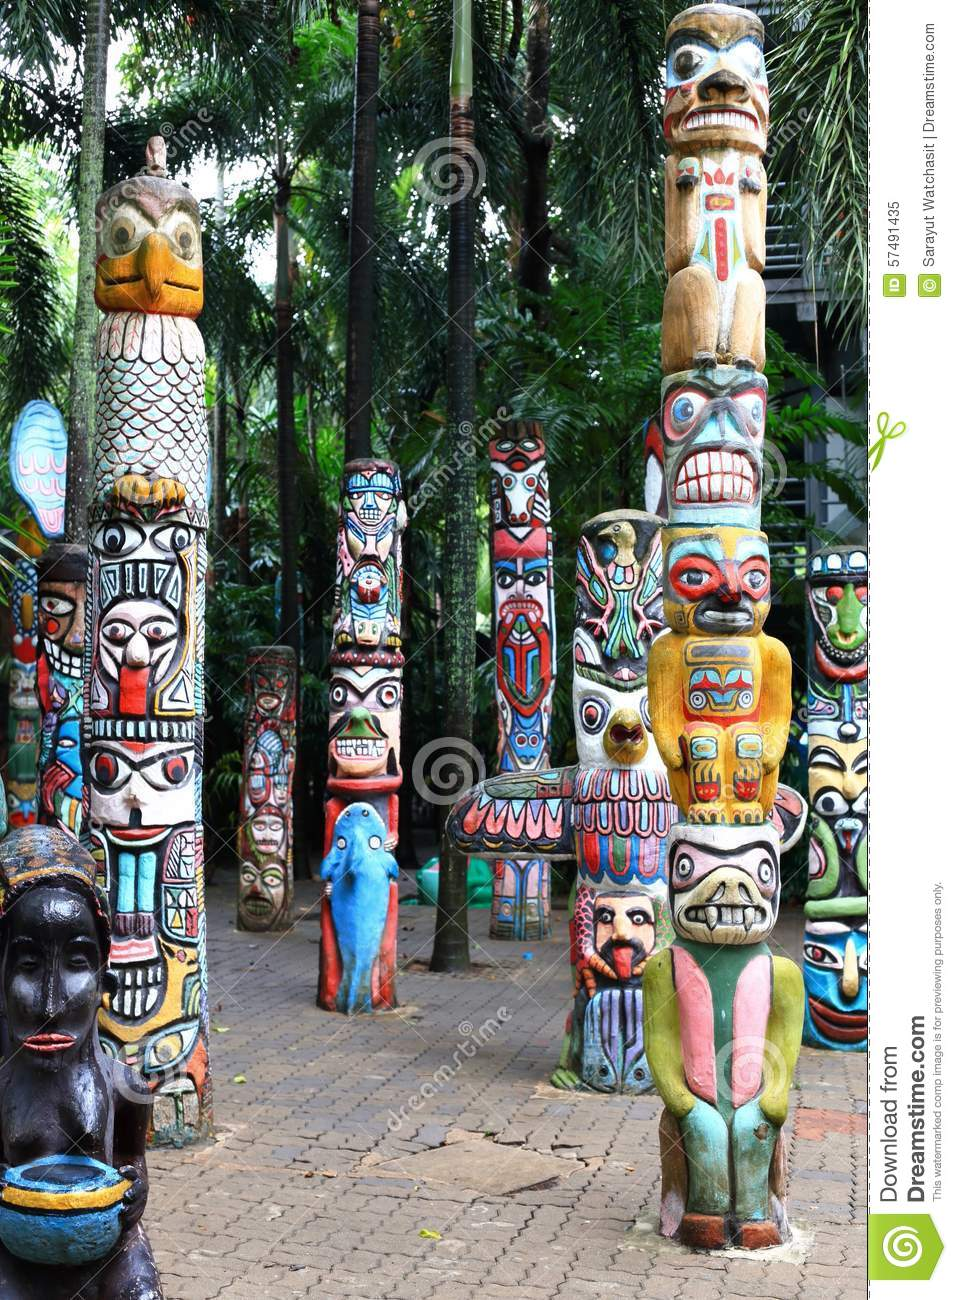 Totem Pole Stock Image  Image Of States, Animals, Columbia